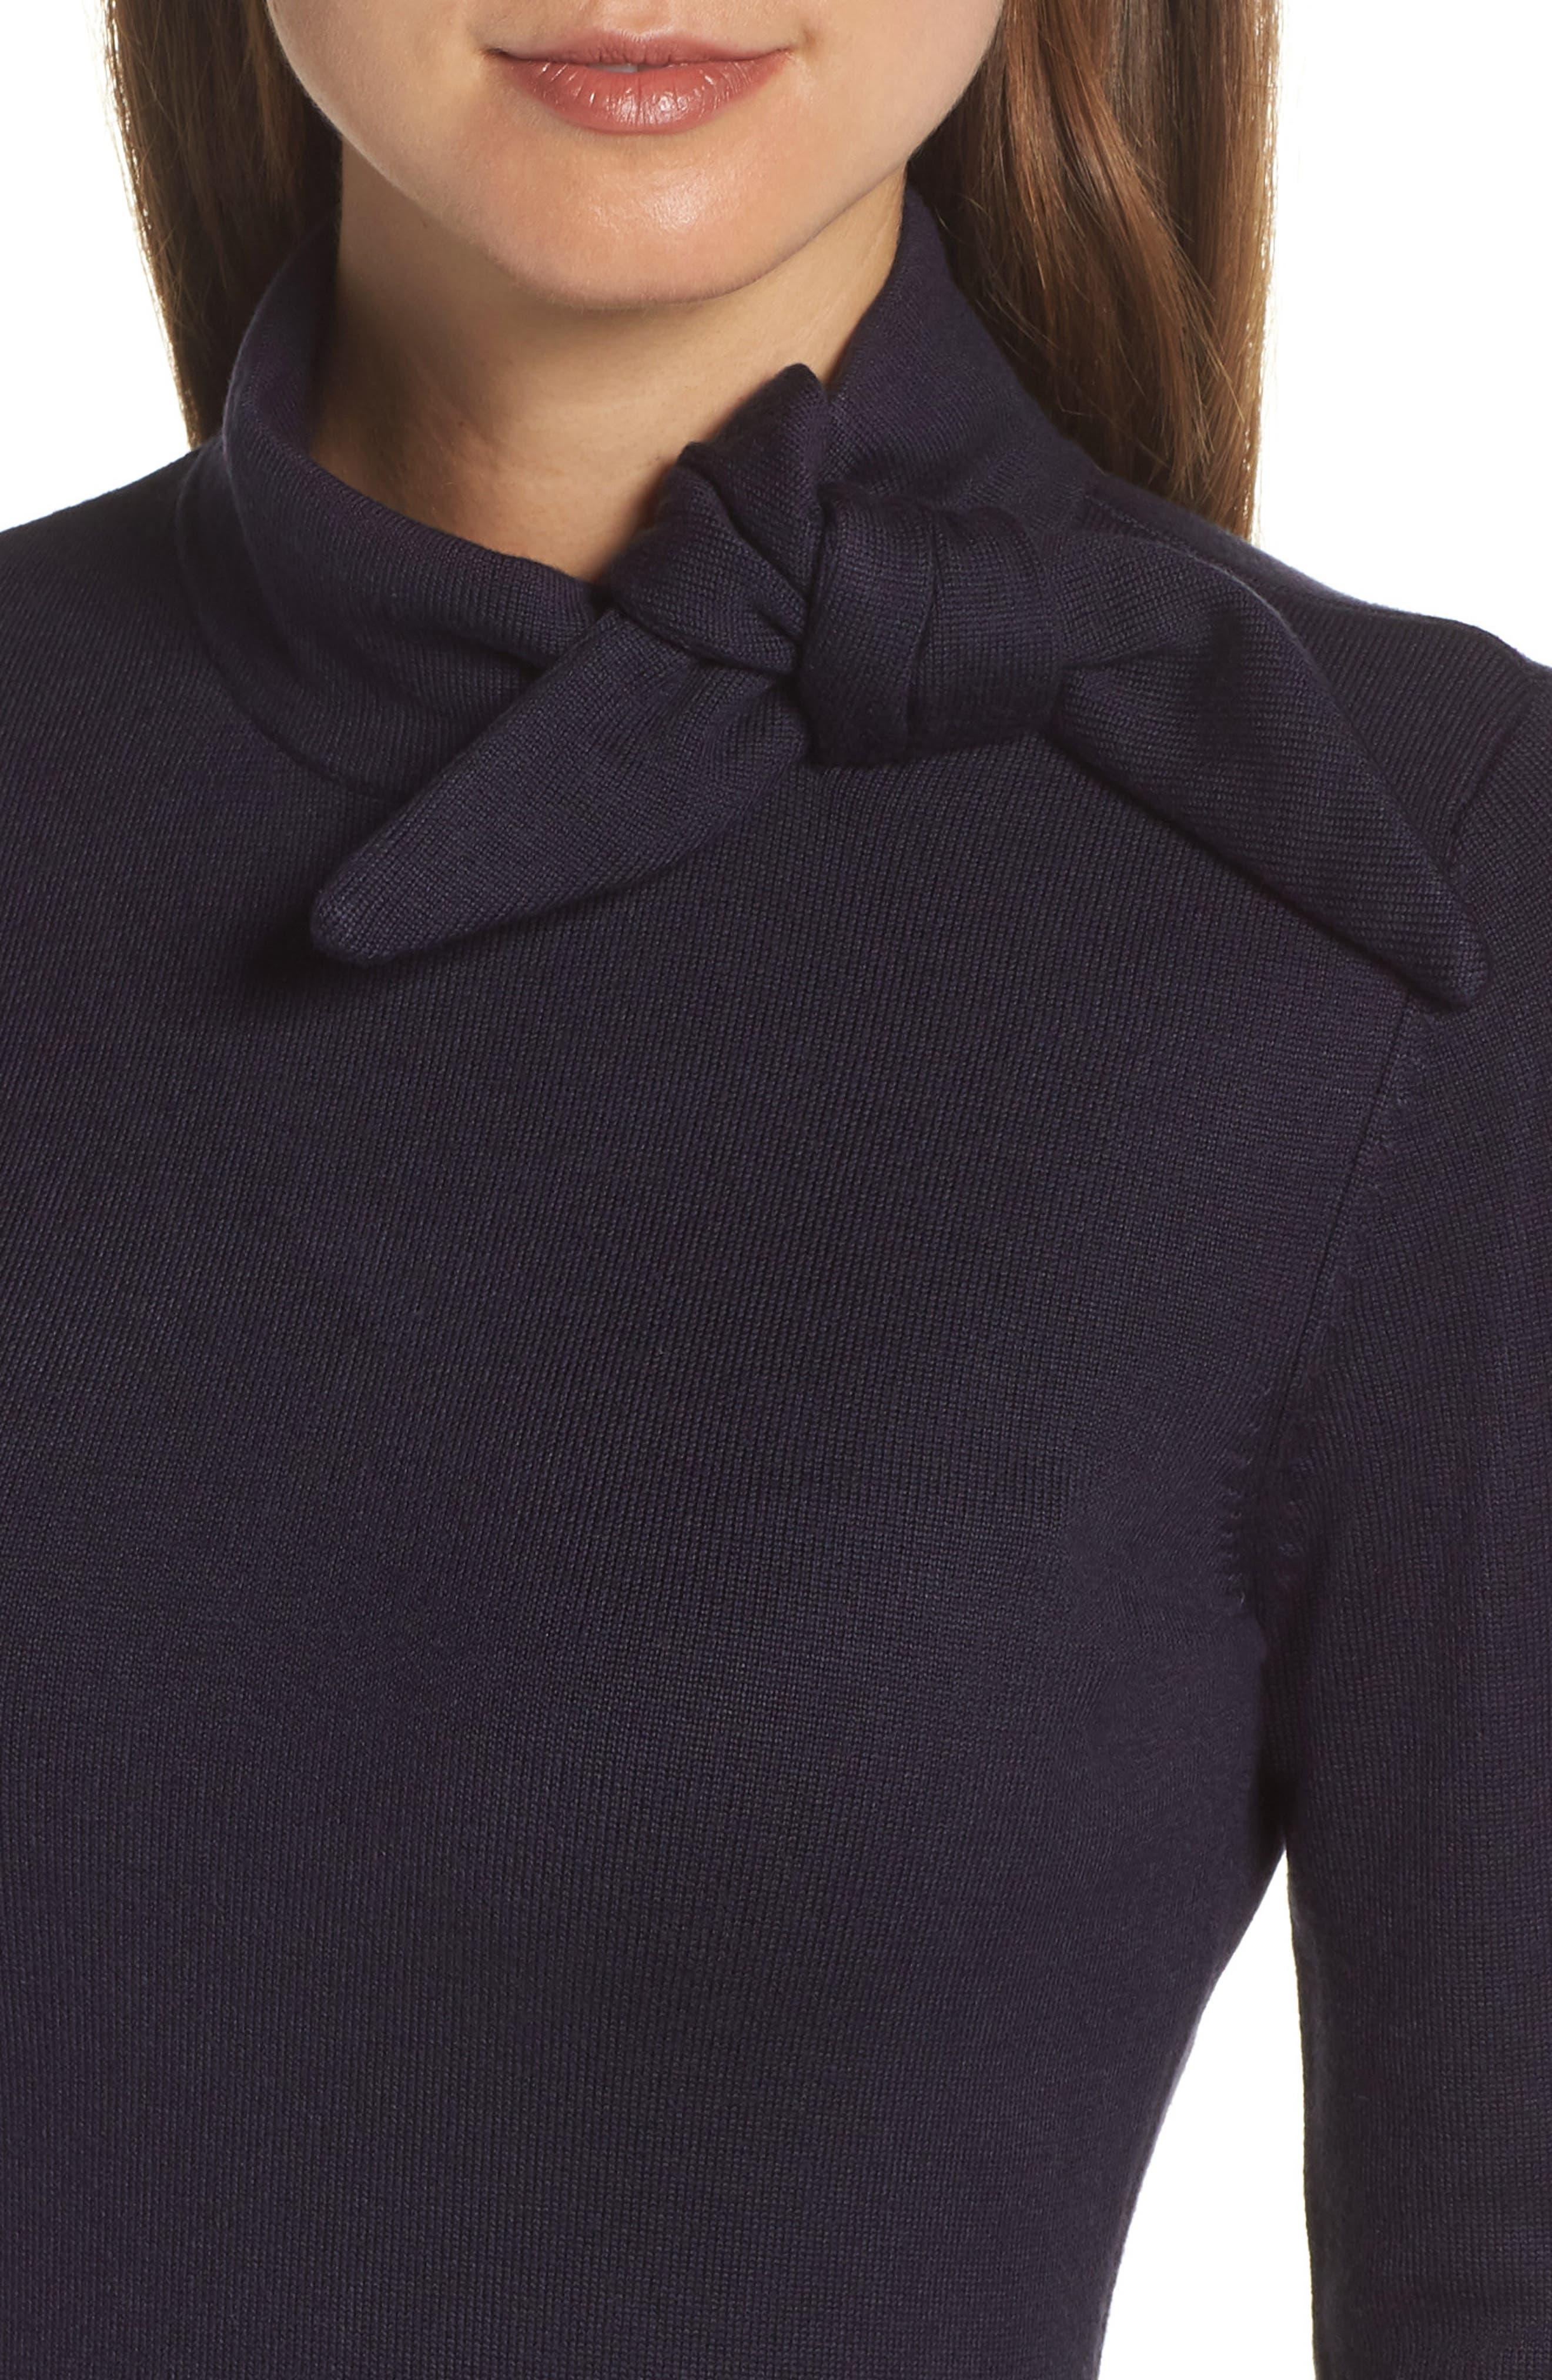 Tie Neck Fit & Flare Dress,                             Alternate thumbnail 4, color,                             NAVY